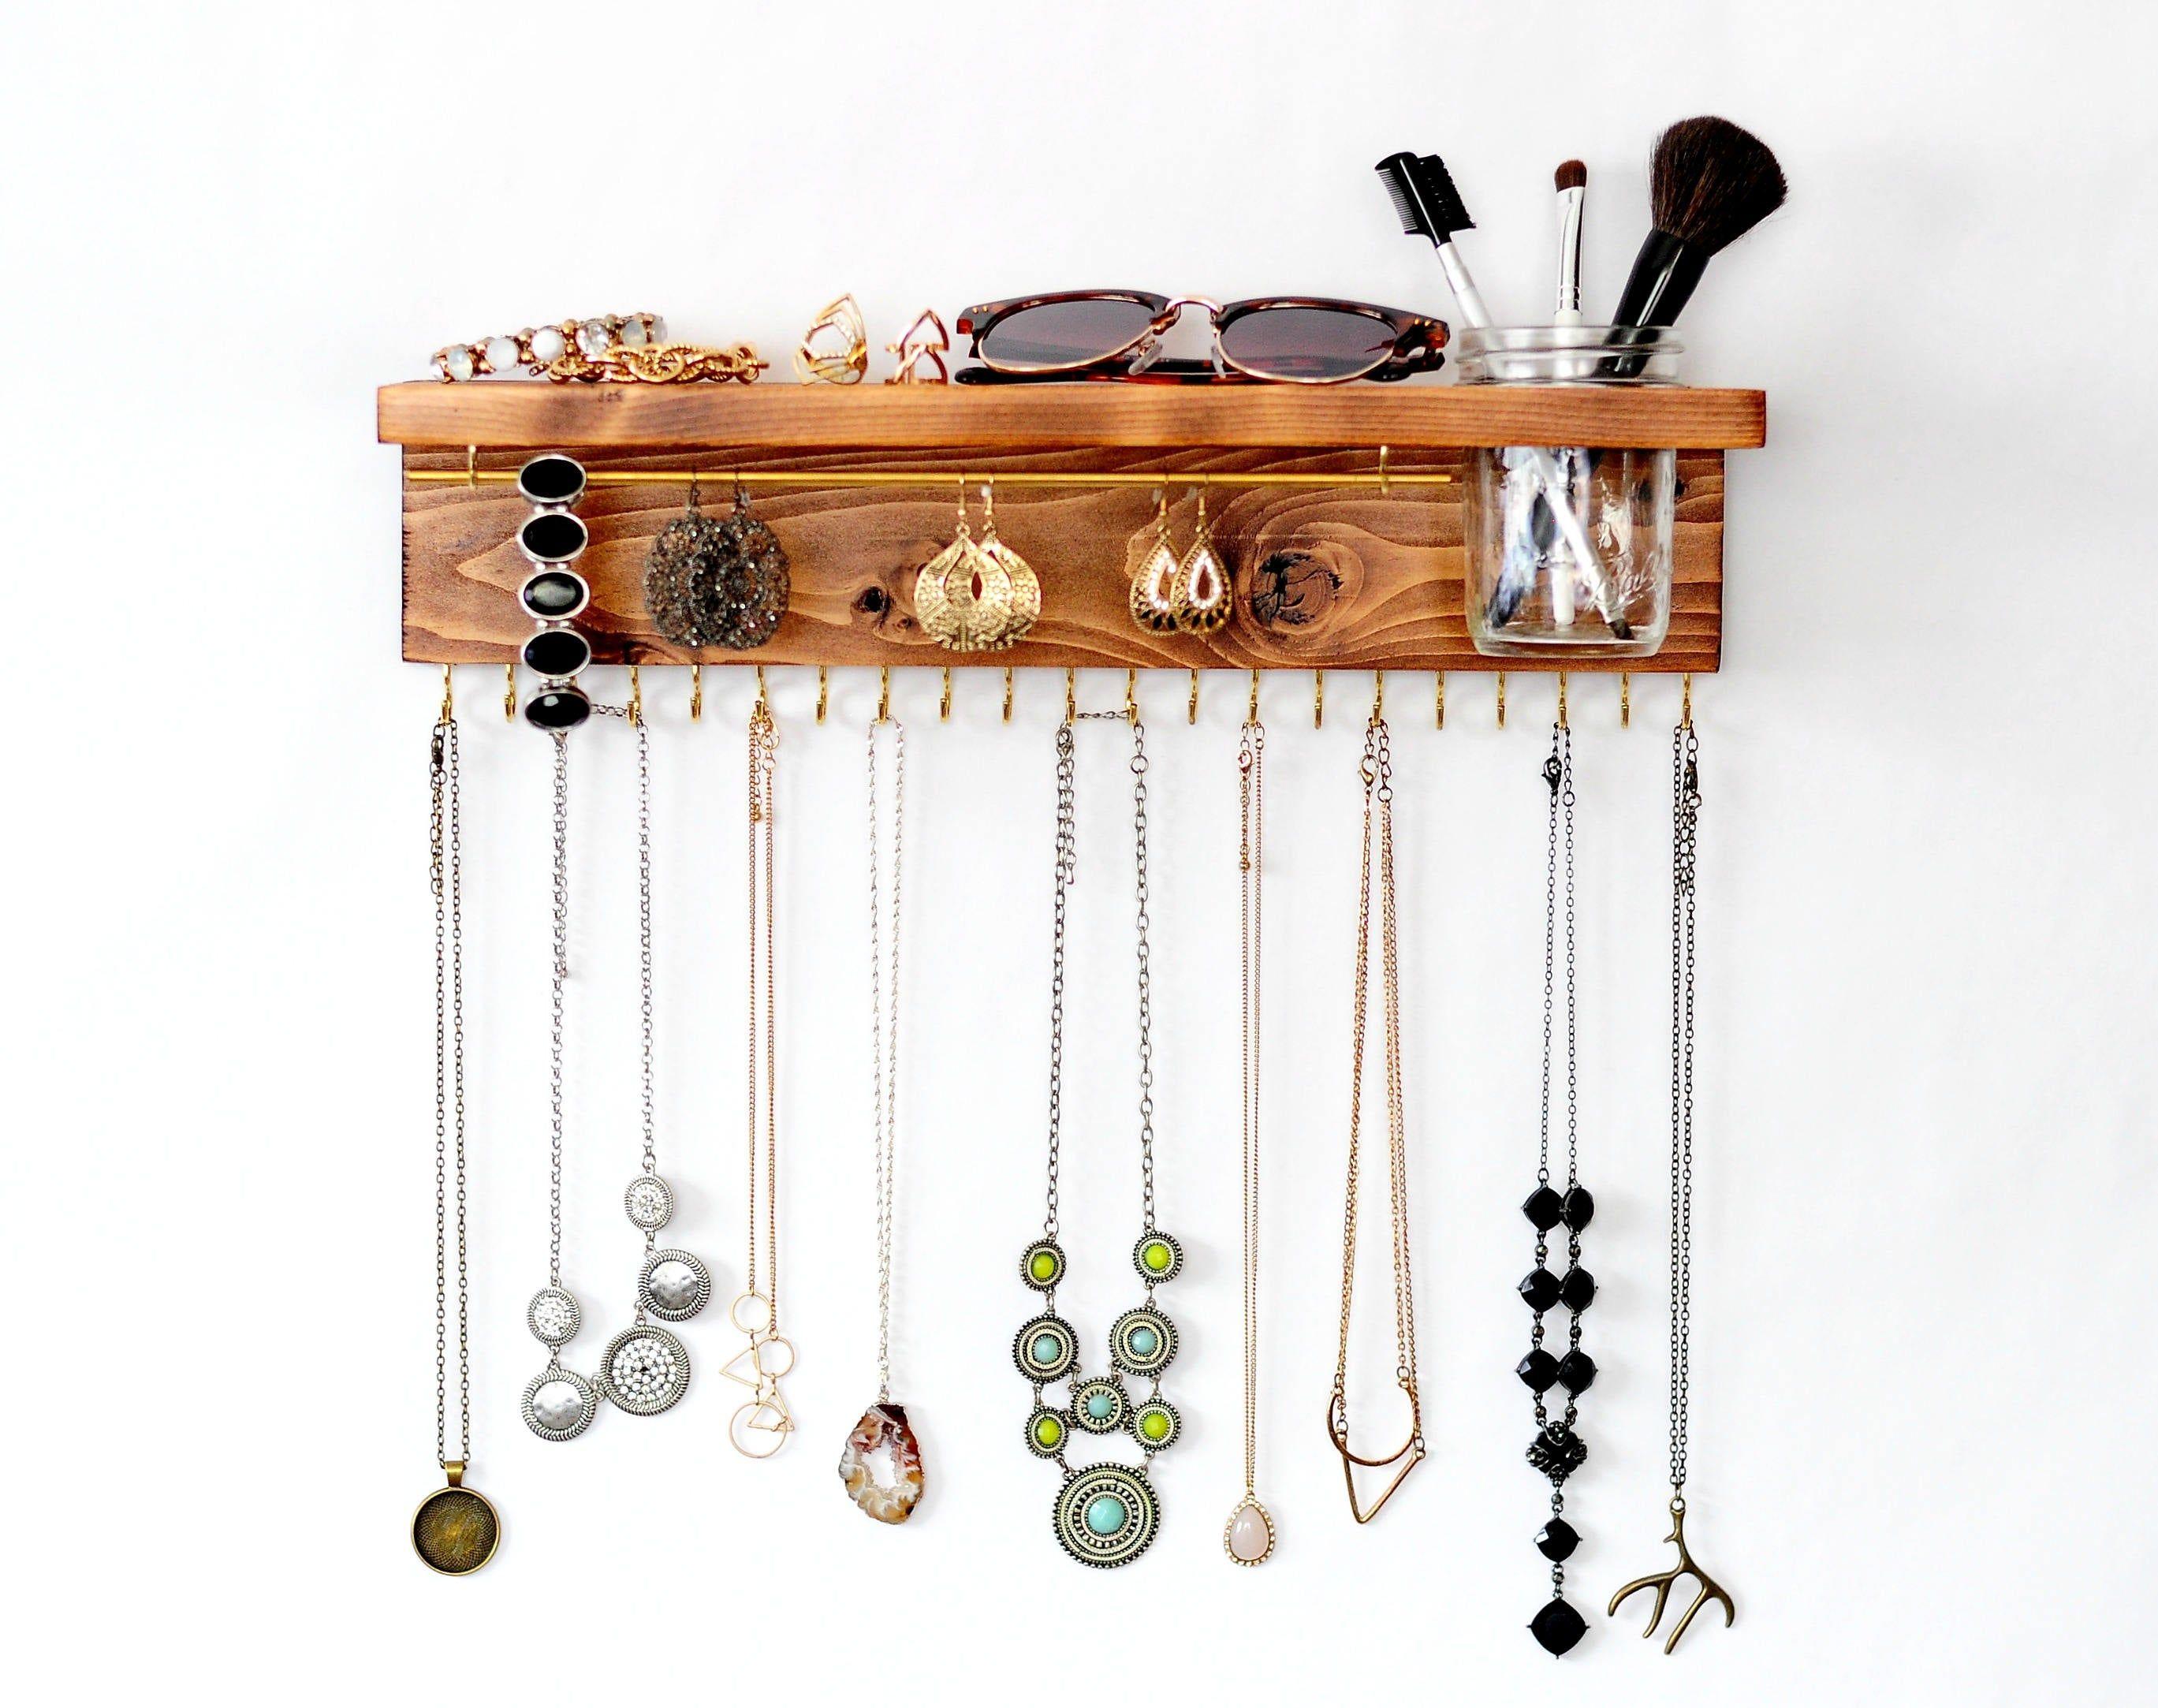 Jewelry holder with bracelet bars Jewelry Organizer necklace hooks Jewelry Display earring display earring holder Jewelry storage